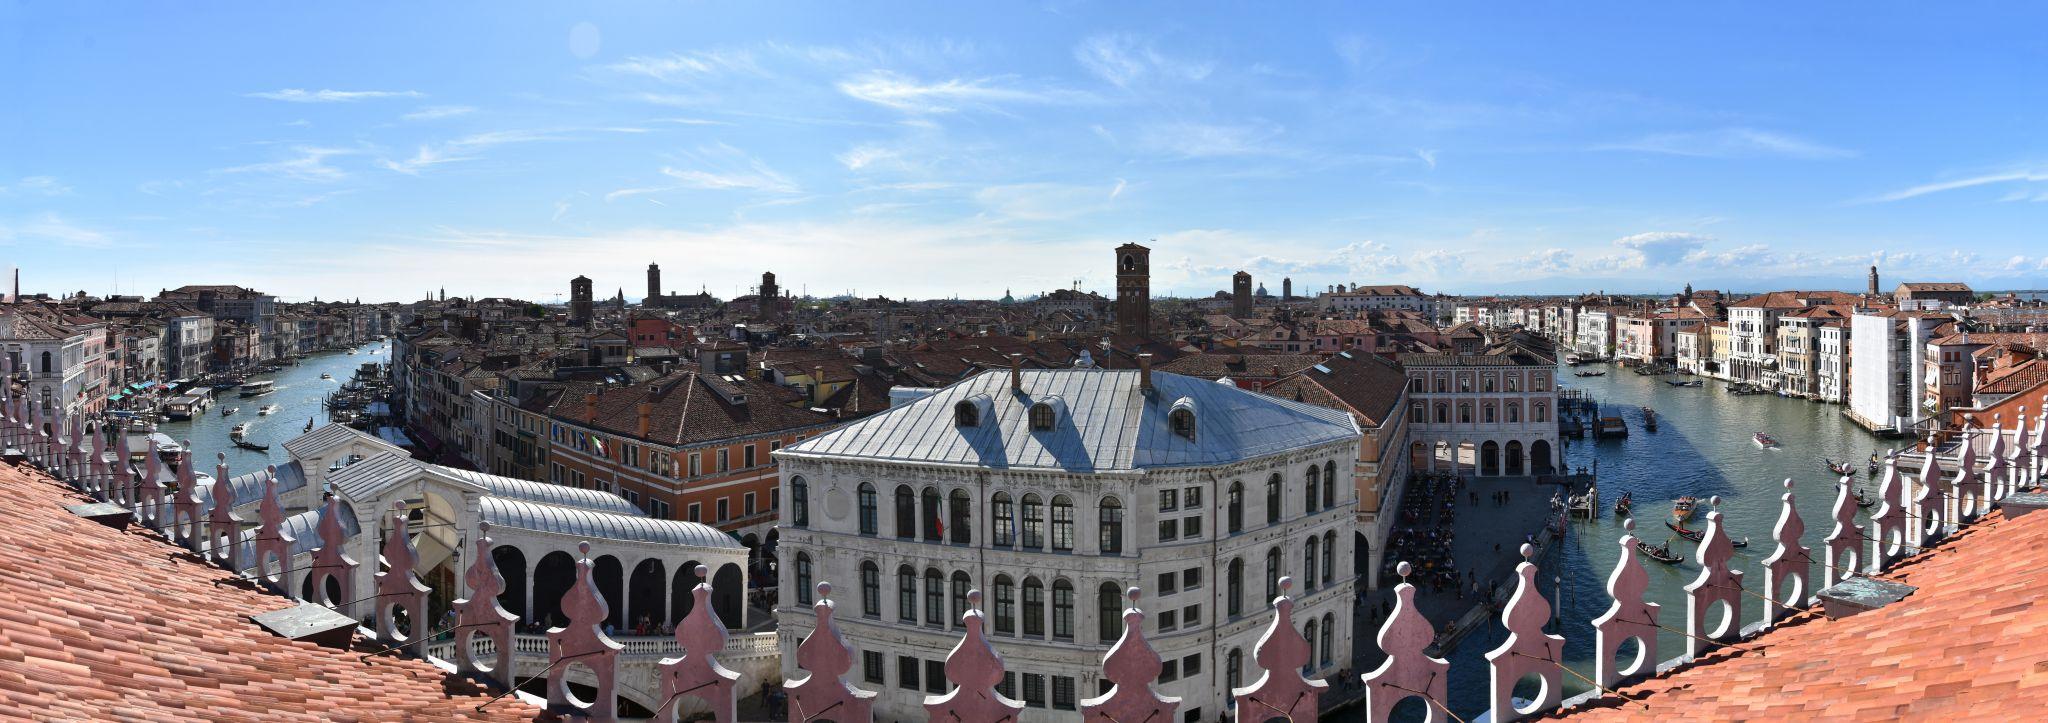 T Fondaco Dei Tedeschi Rooftop Terrace View Italy